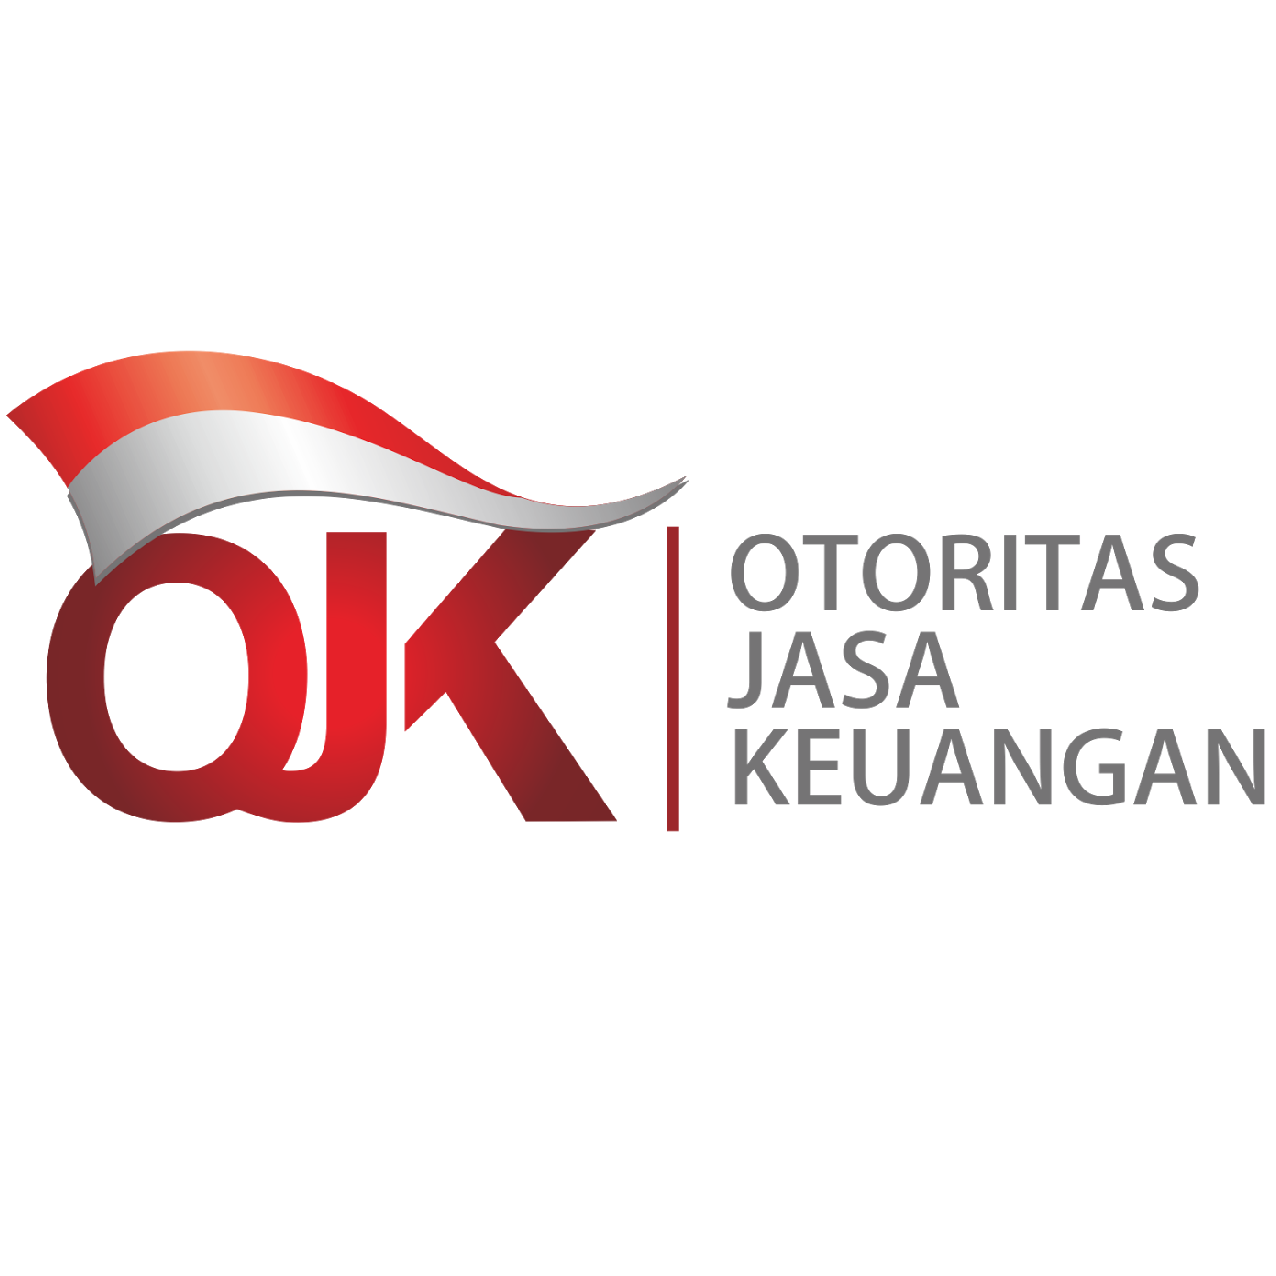 Ojk  otoritas jasa keuangan  vector logo